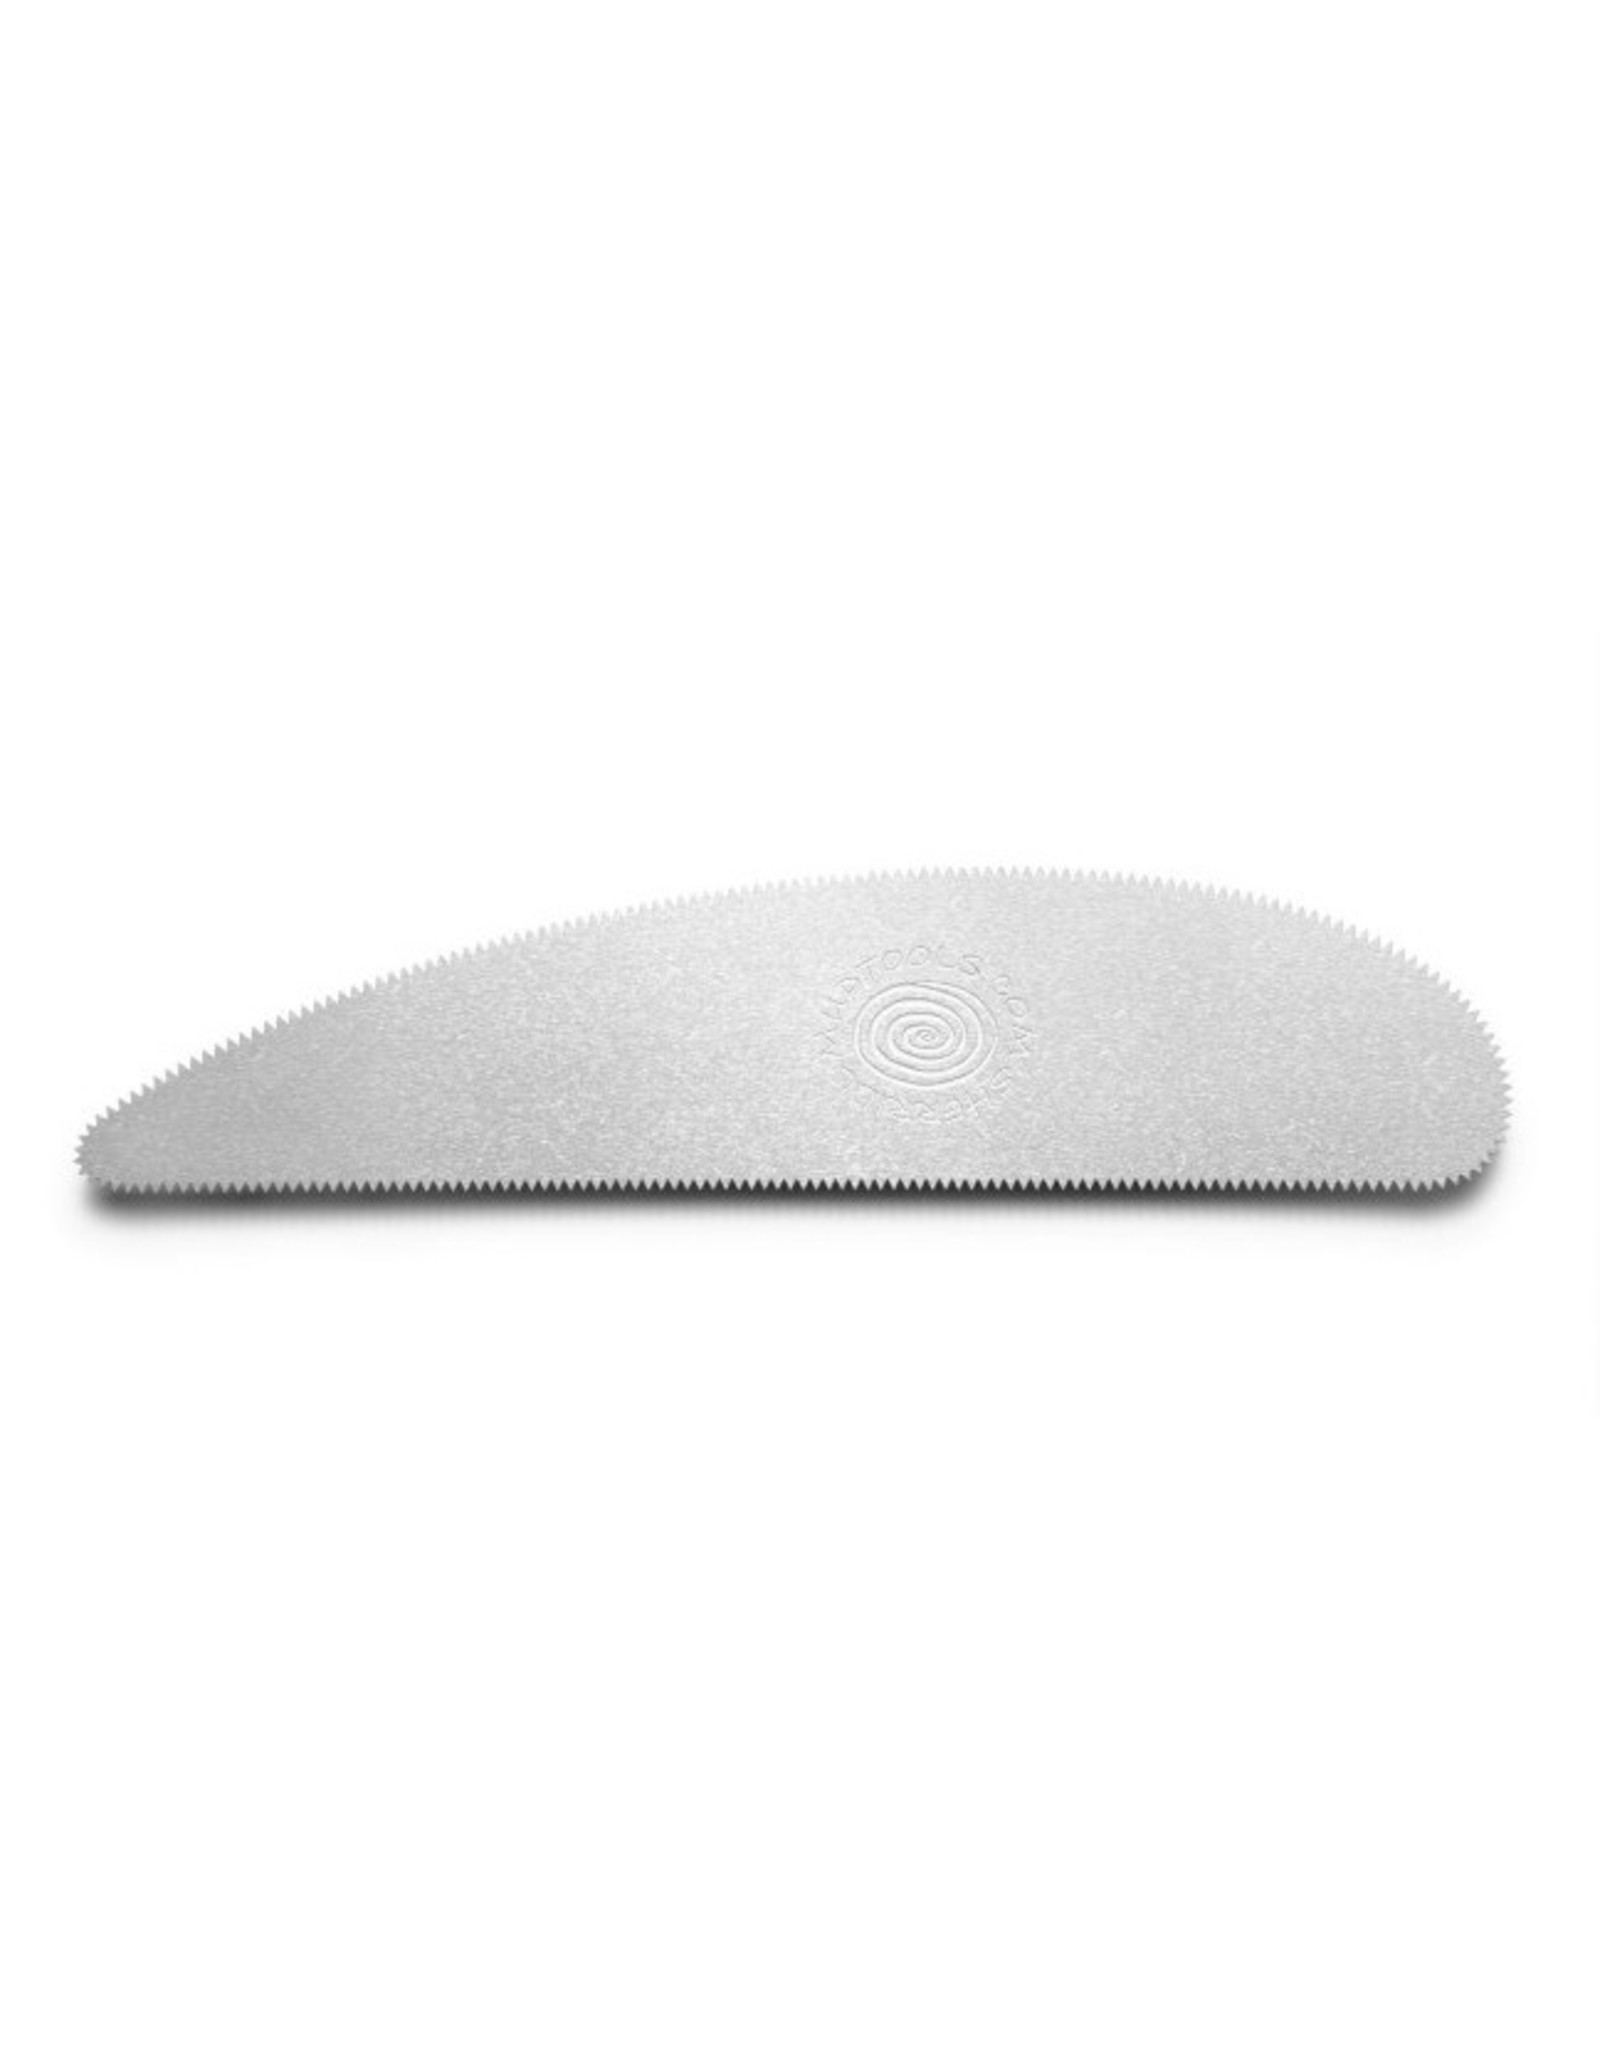 Mudtools Long Scraper Rib (fine Serrated) stainless steel